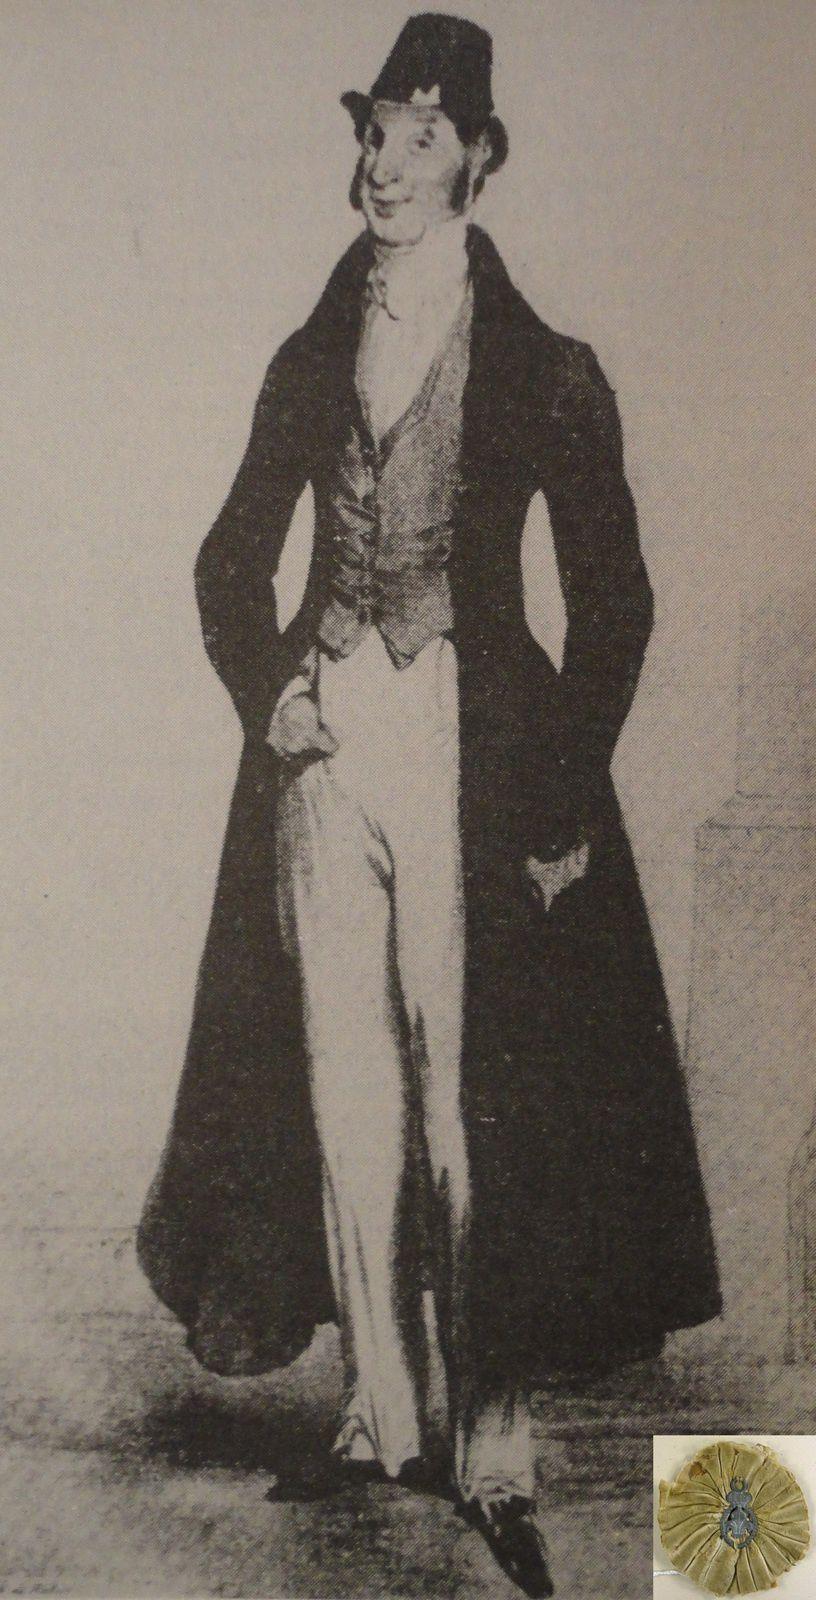 JULES DE POLIGNAC (1780-1847)